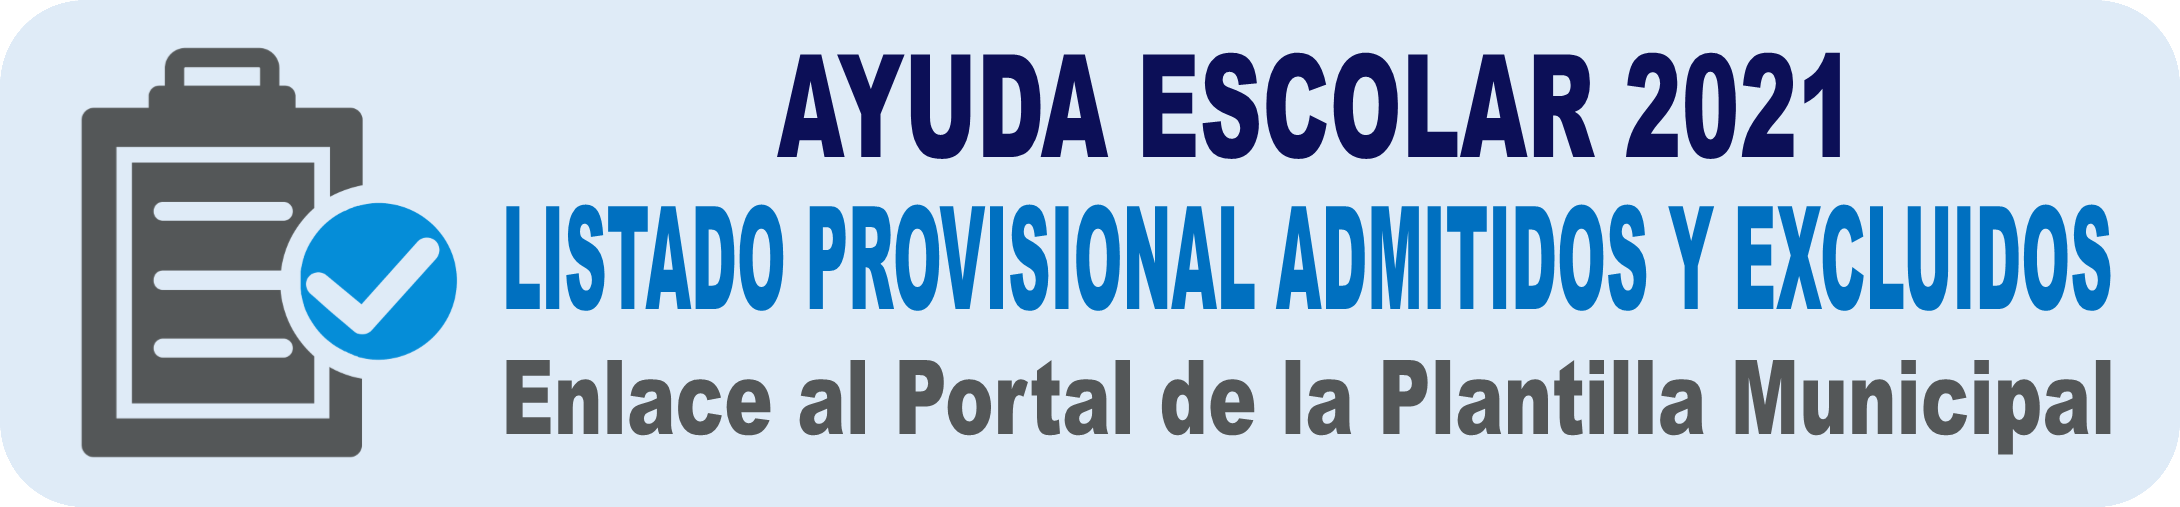 ADMITIDOS/EXCLUIDOS AYUDA ESCOLAR